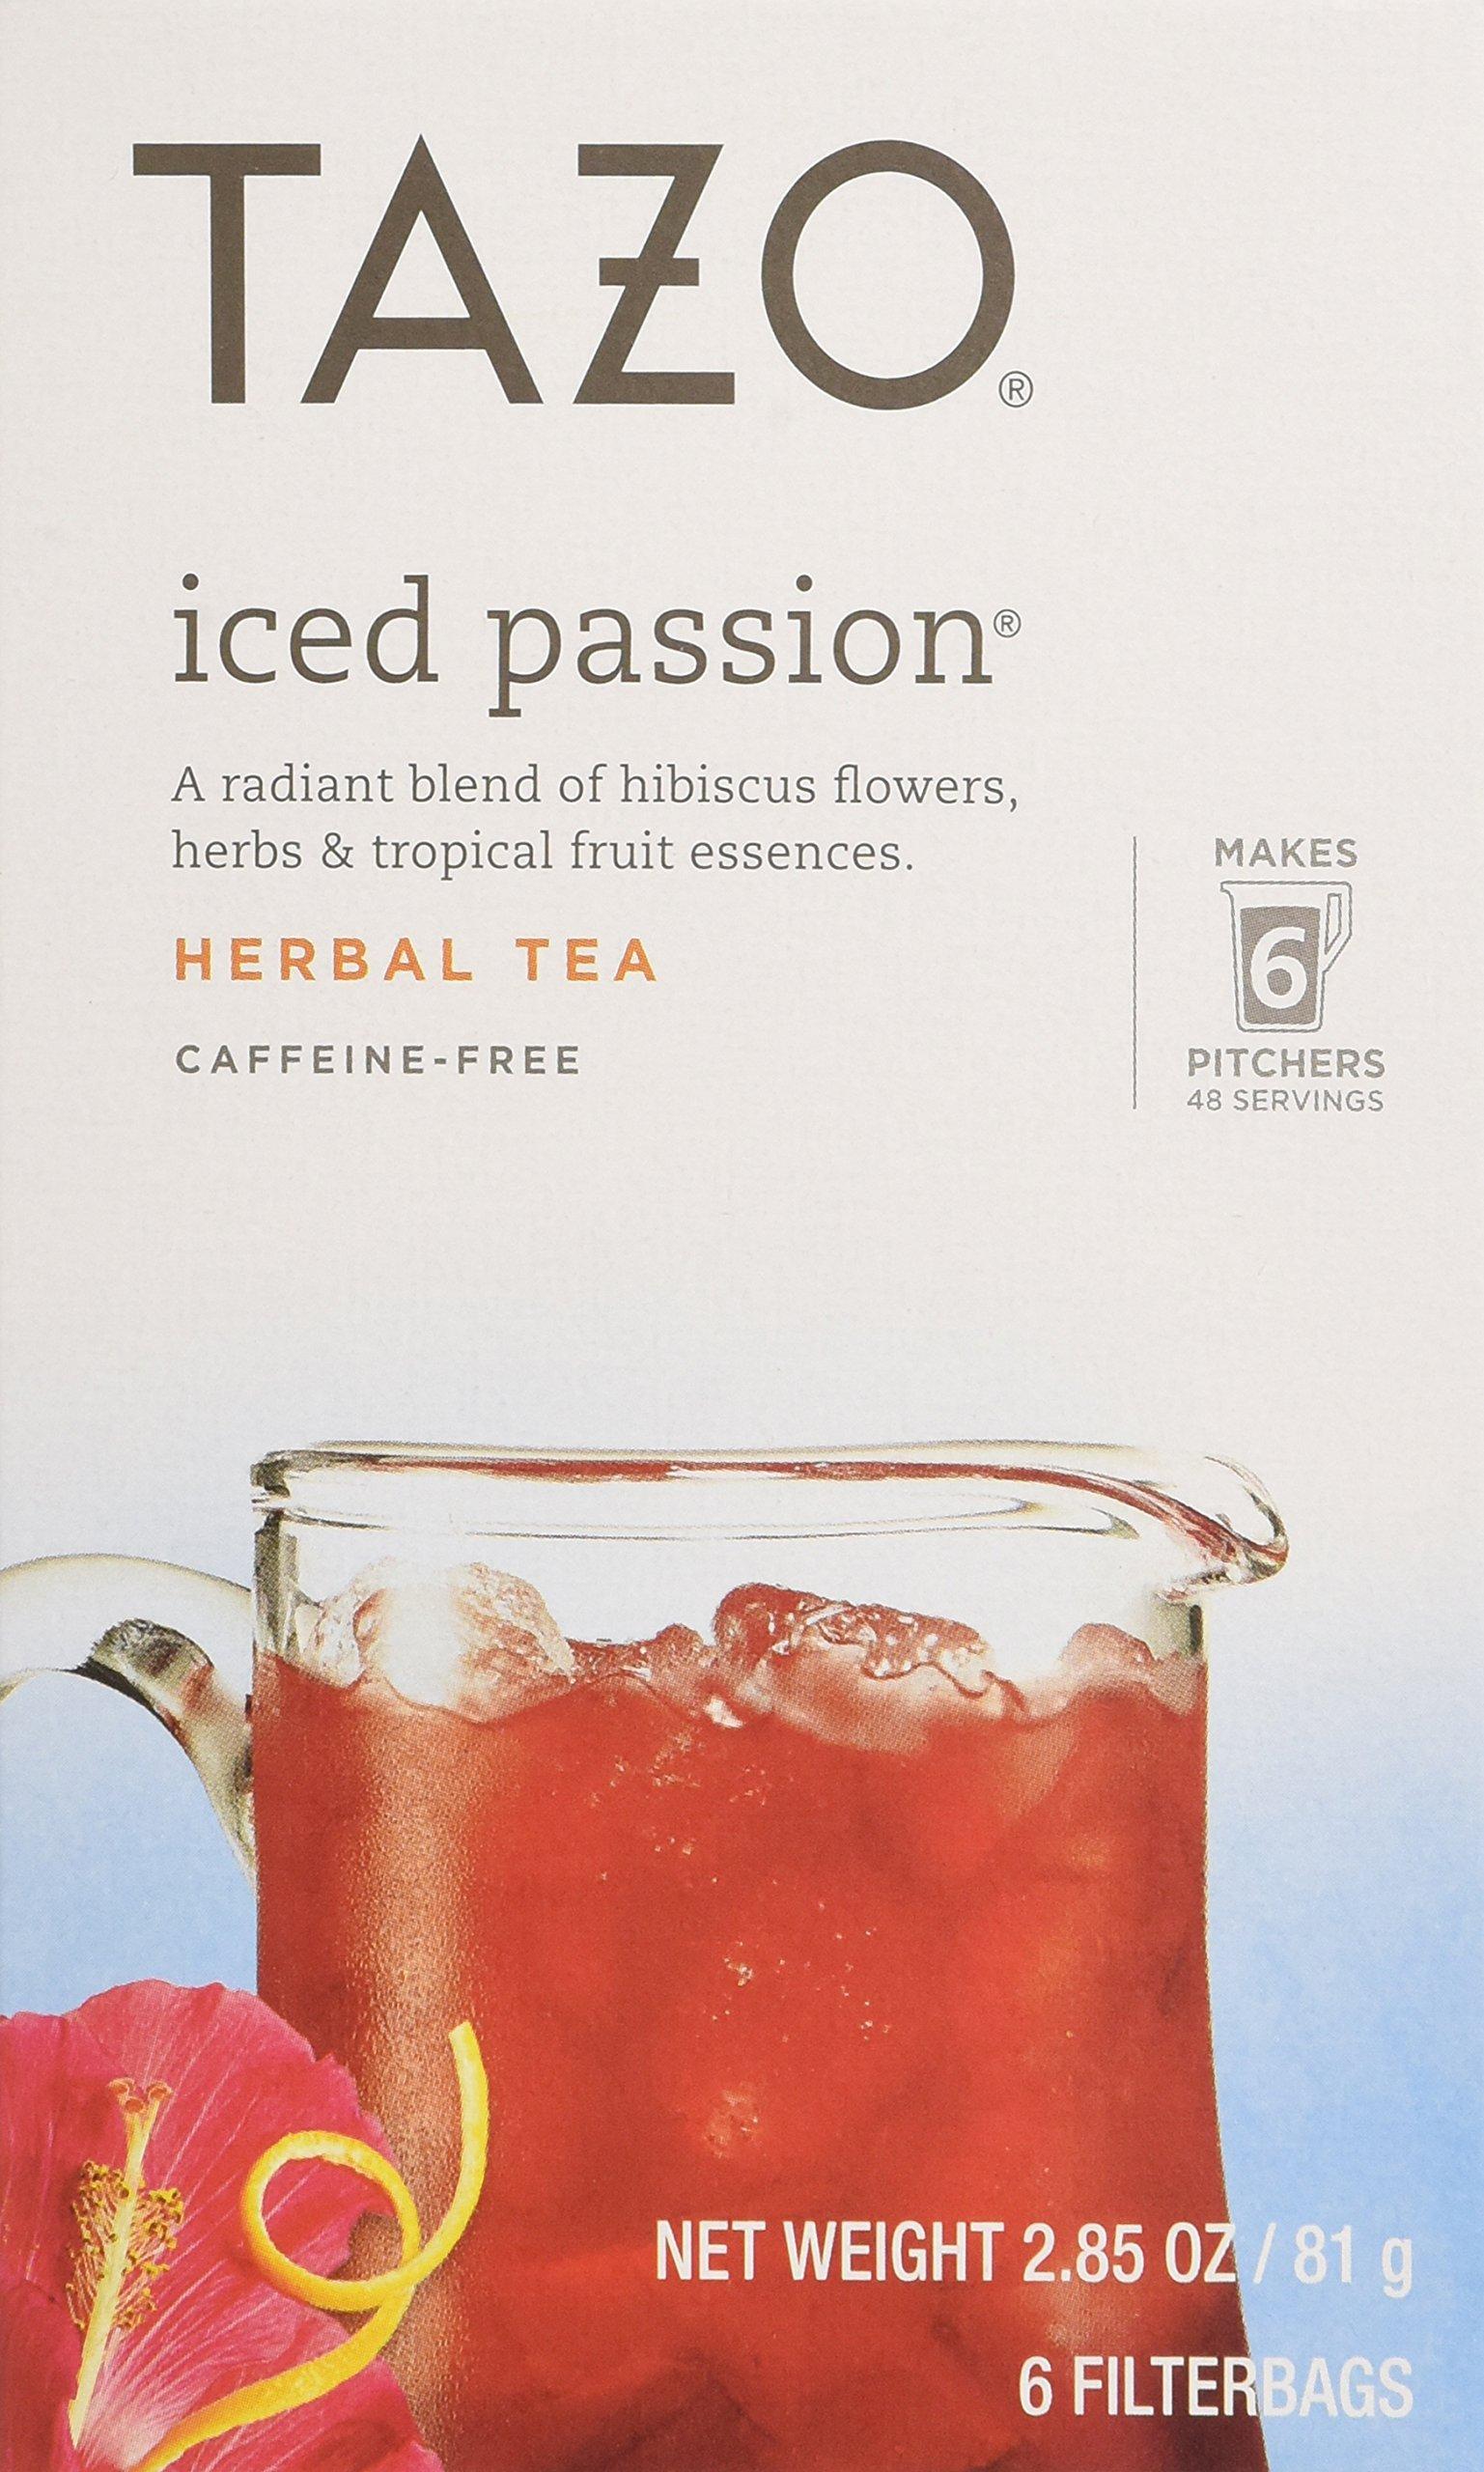 Tazo Iced Tea Passion 6 Bags, 2.85 oz (Case of 4)